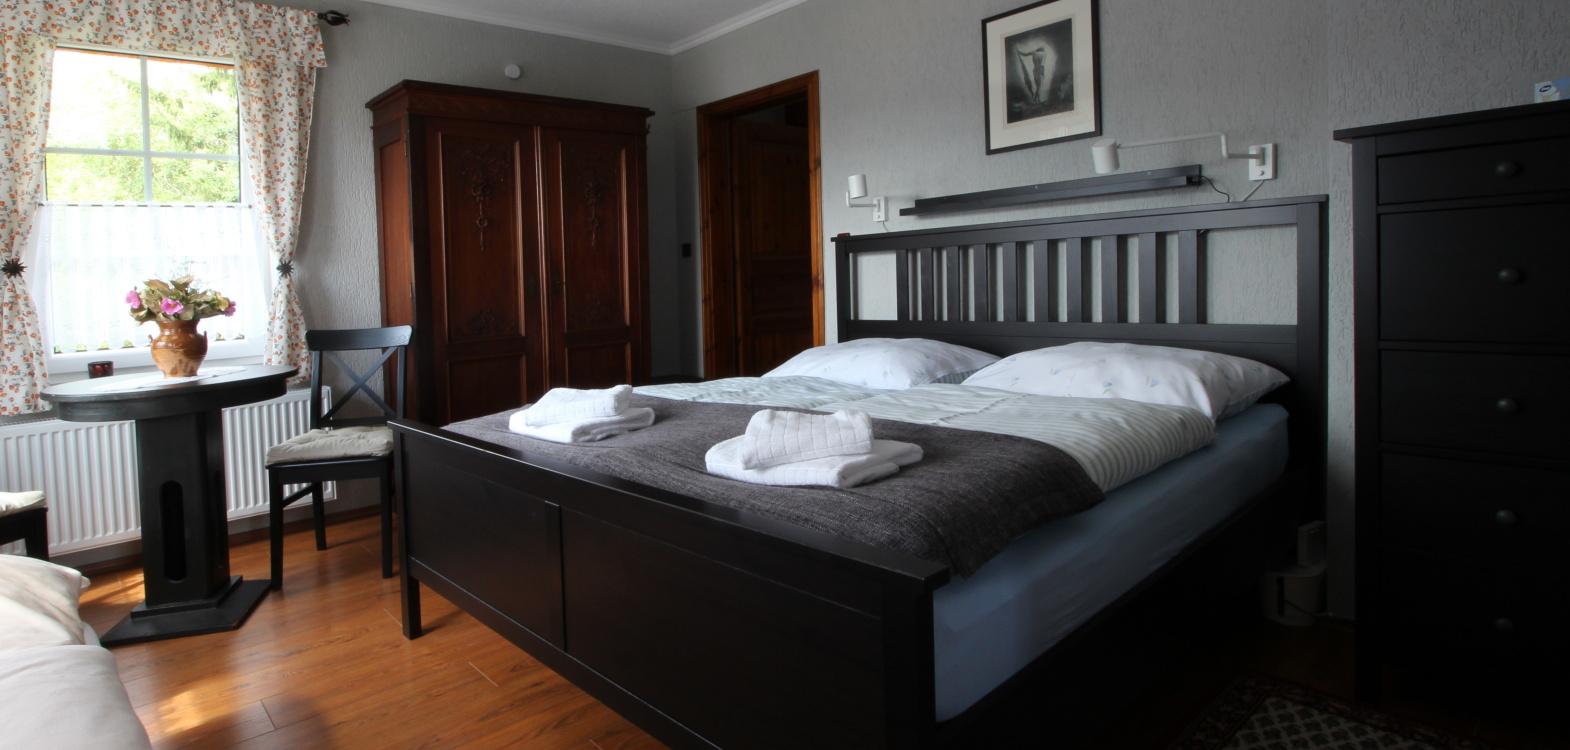 JZ ložnice 1. patro